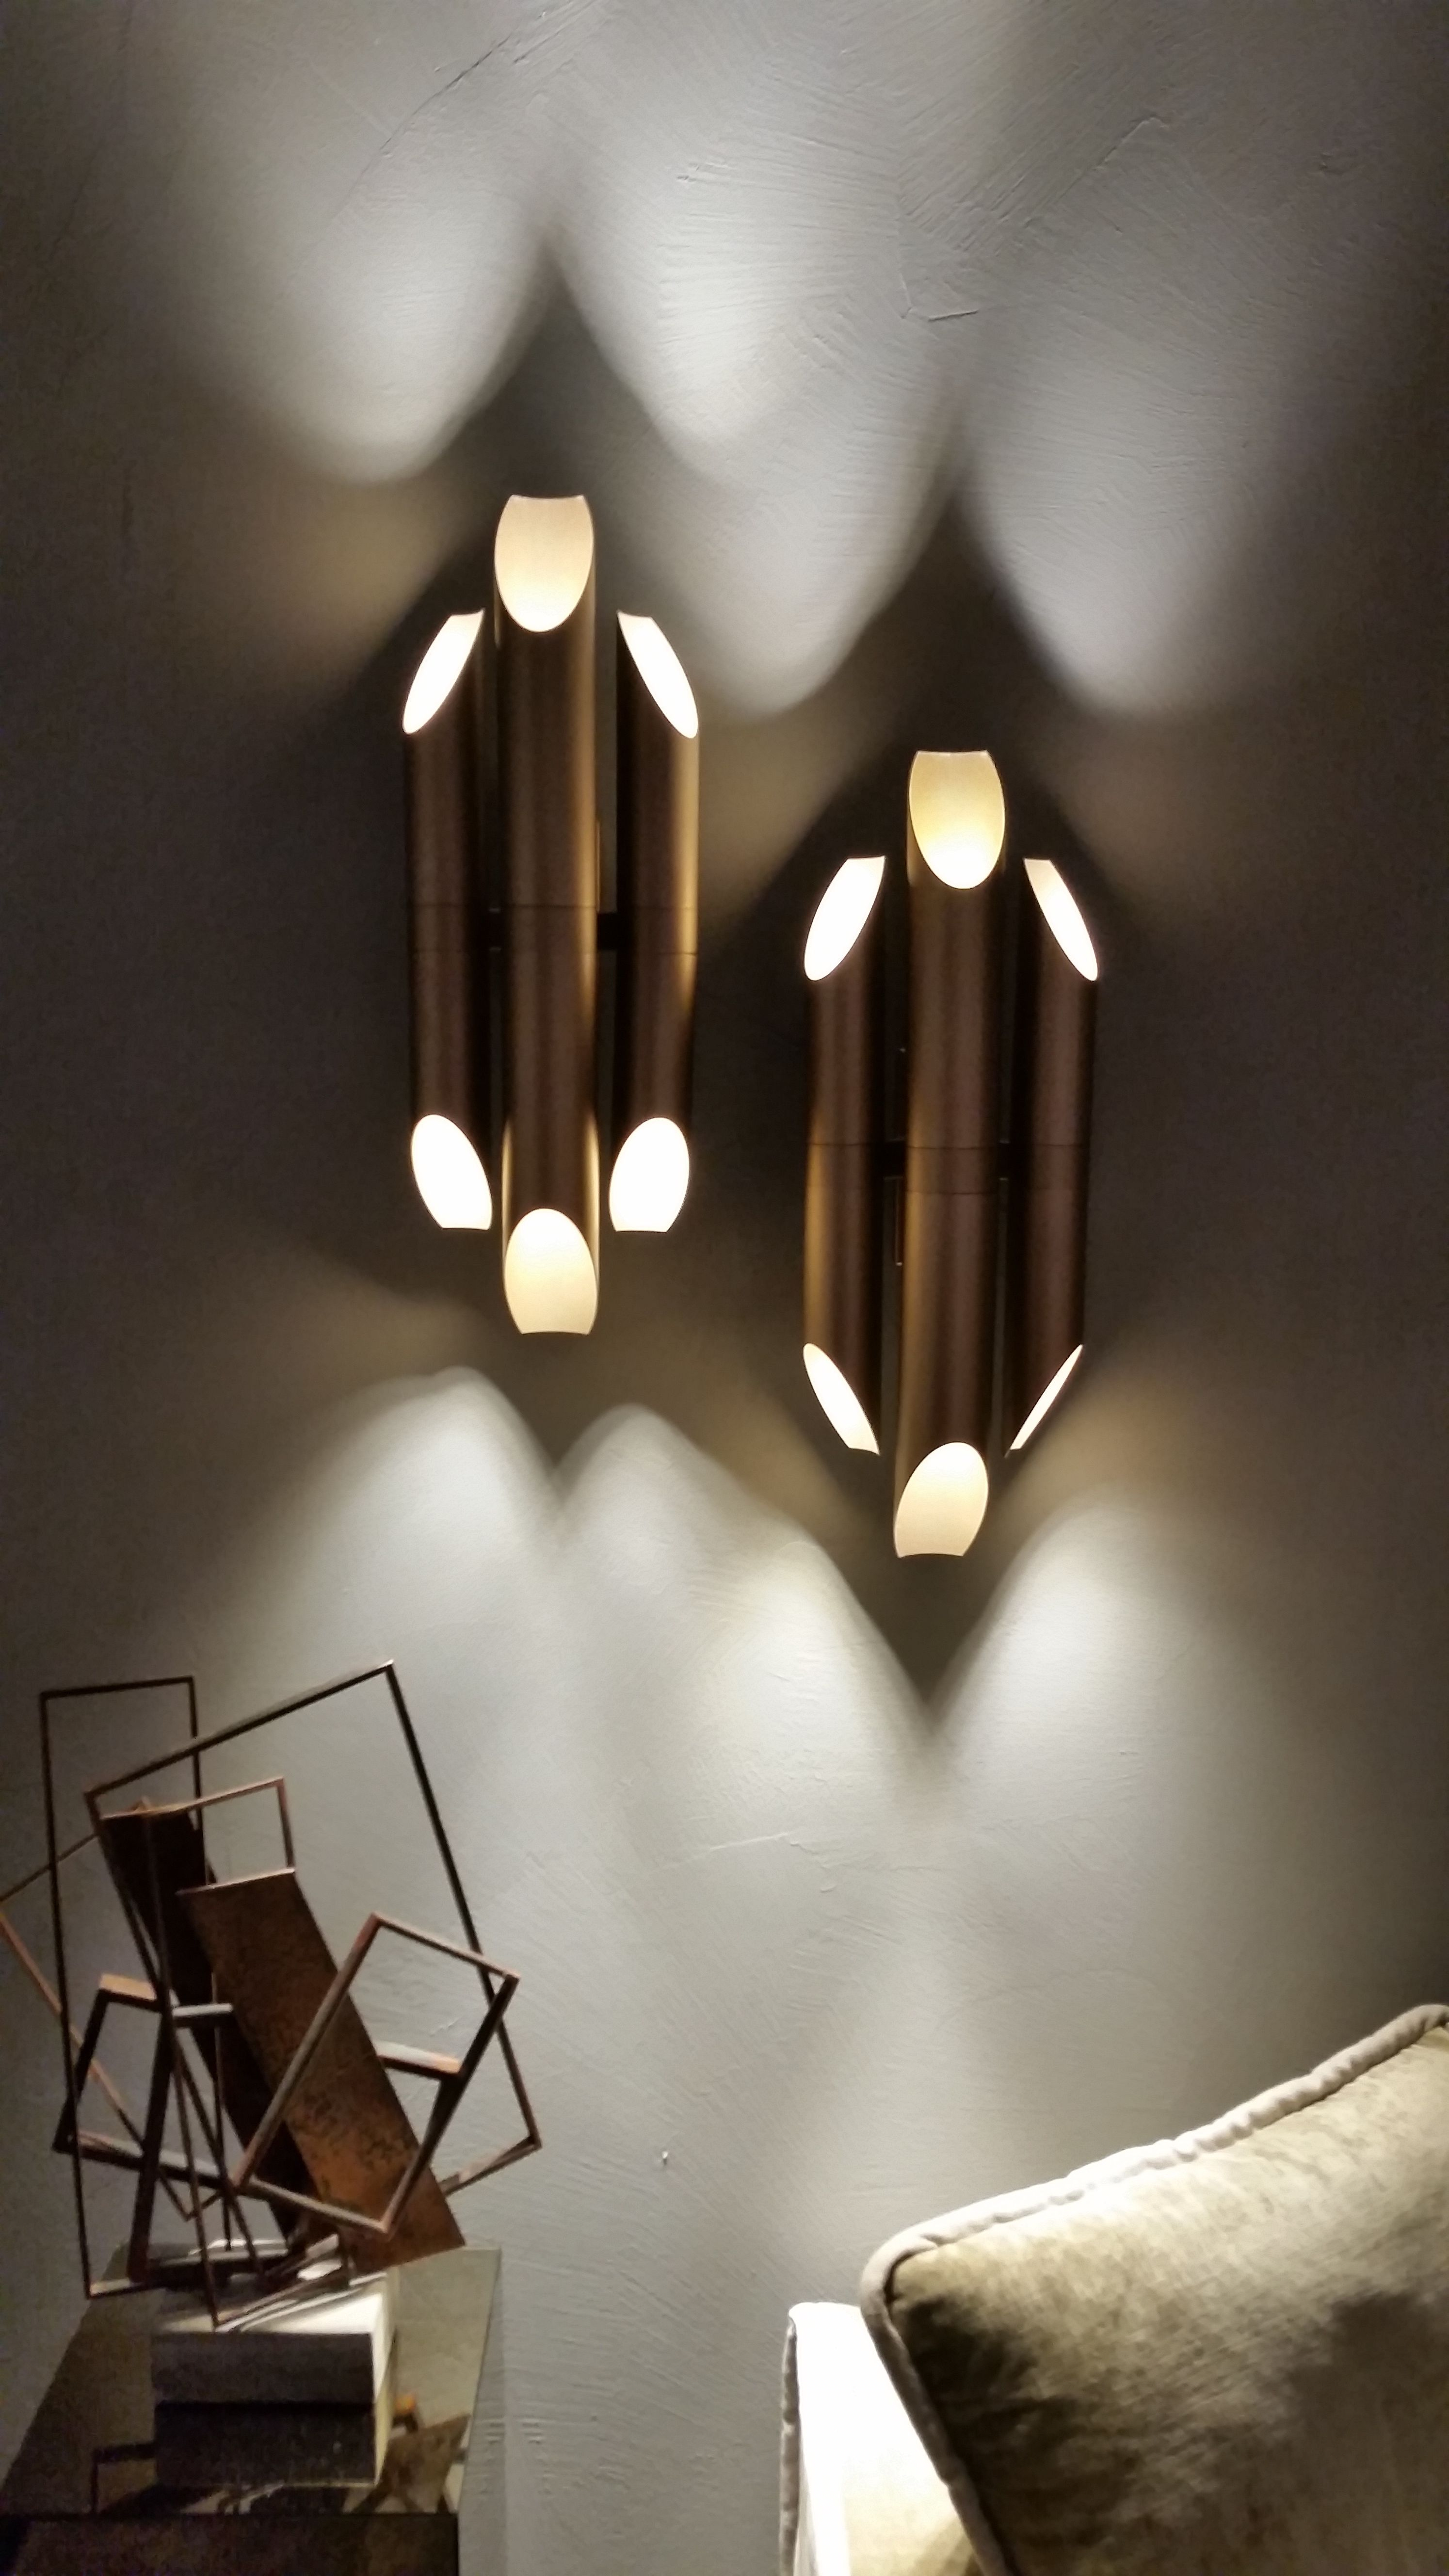 Casamilano tube lights salone del mobile milan design week 2016 decorum times interiors and luxury design blog